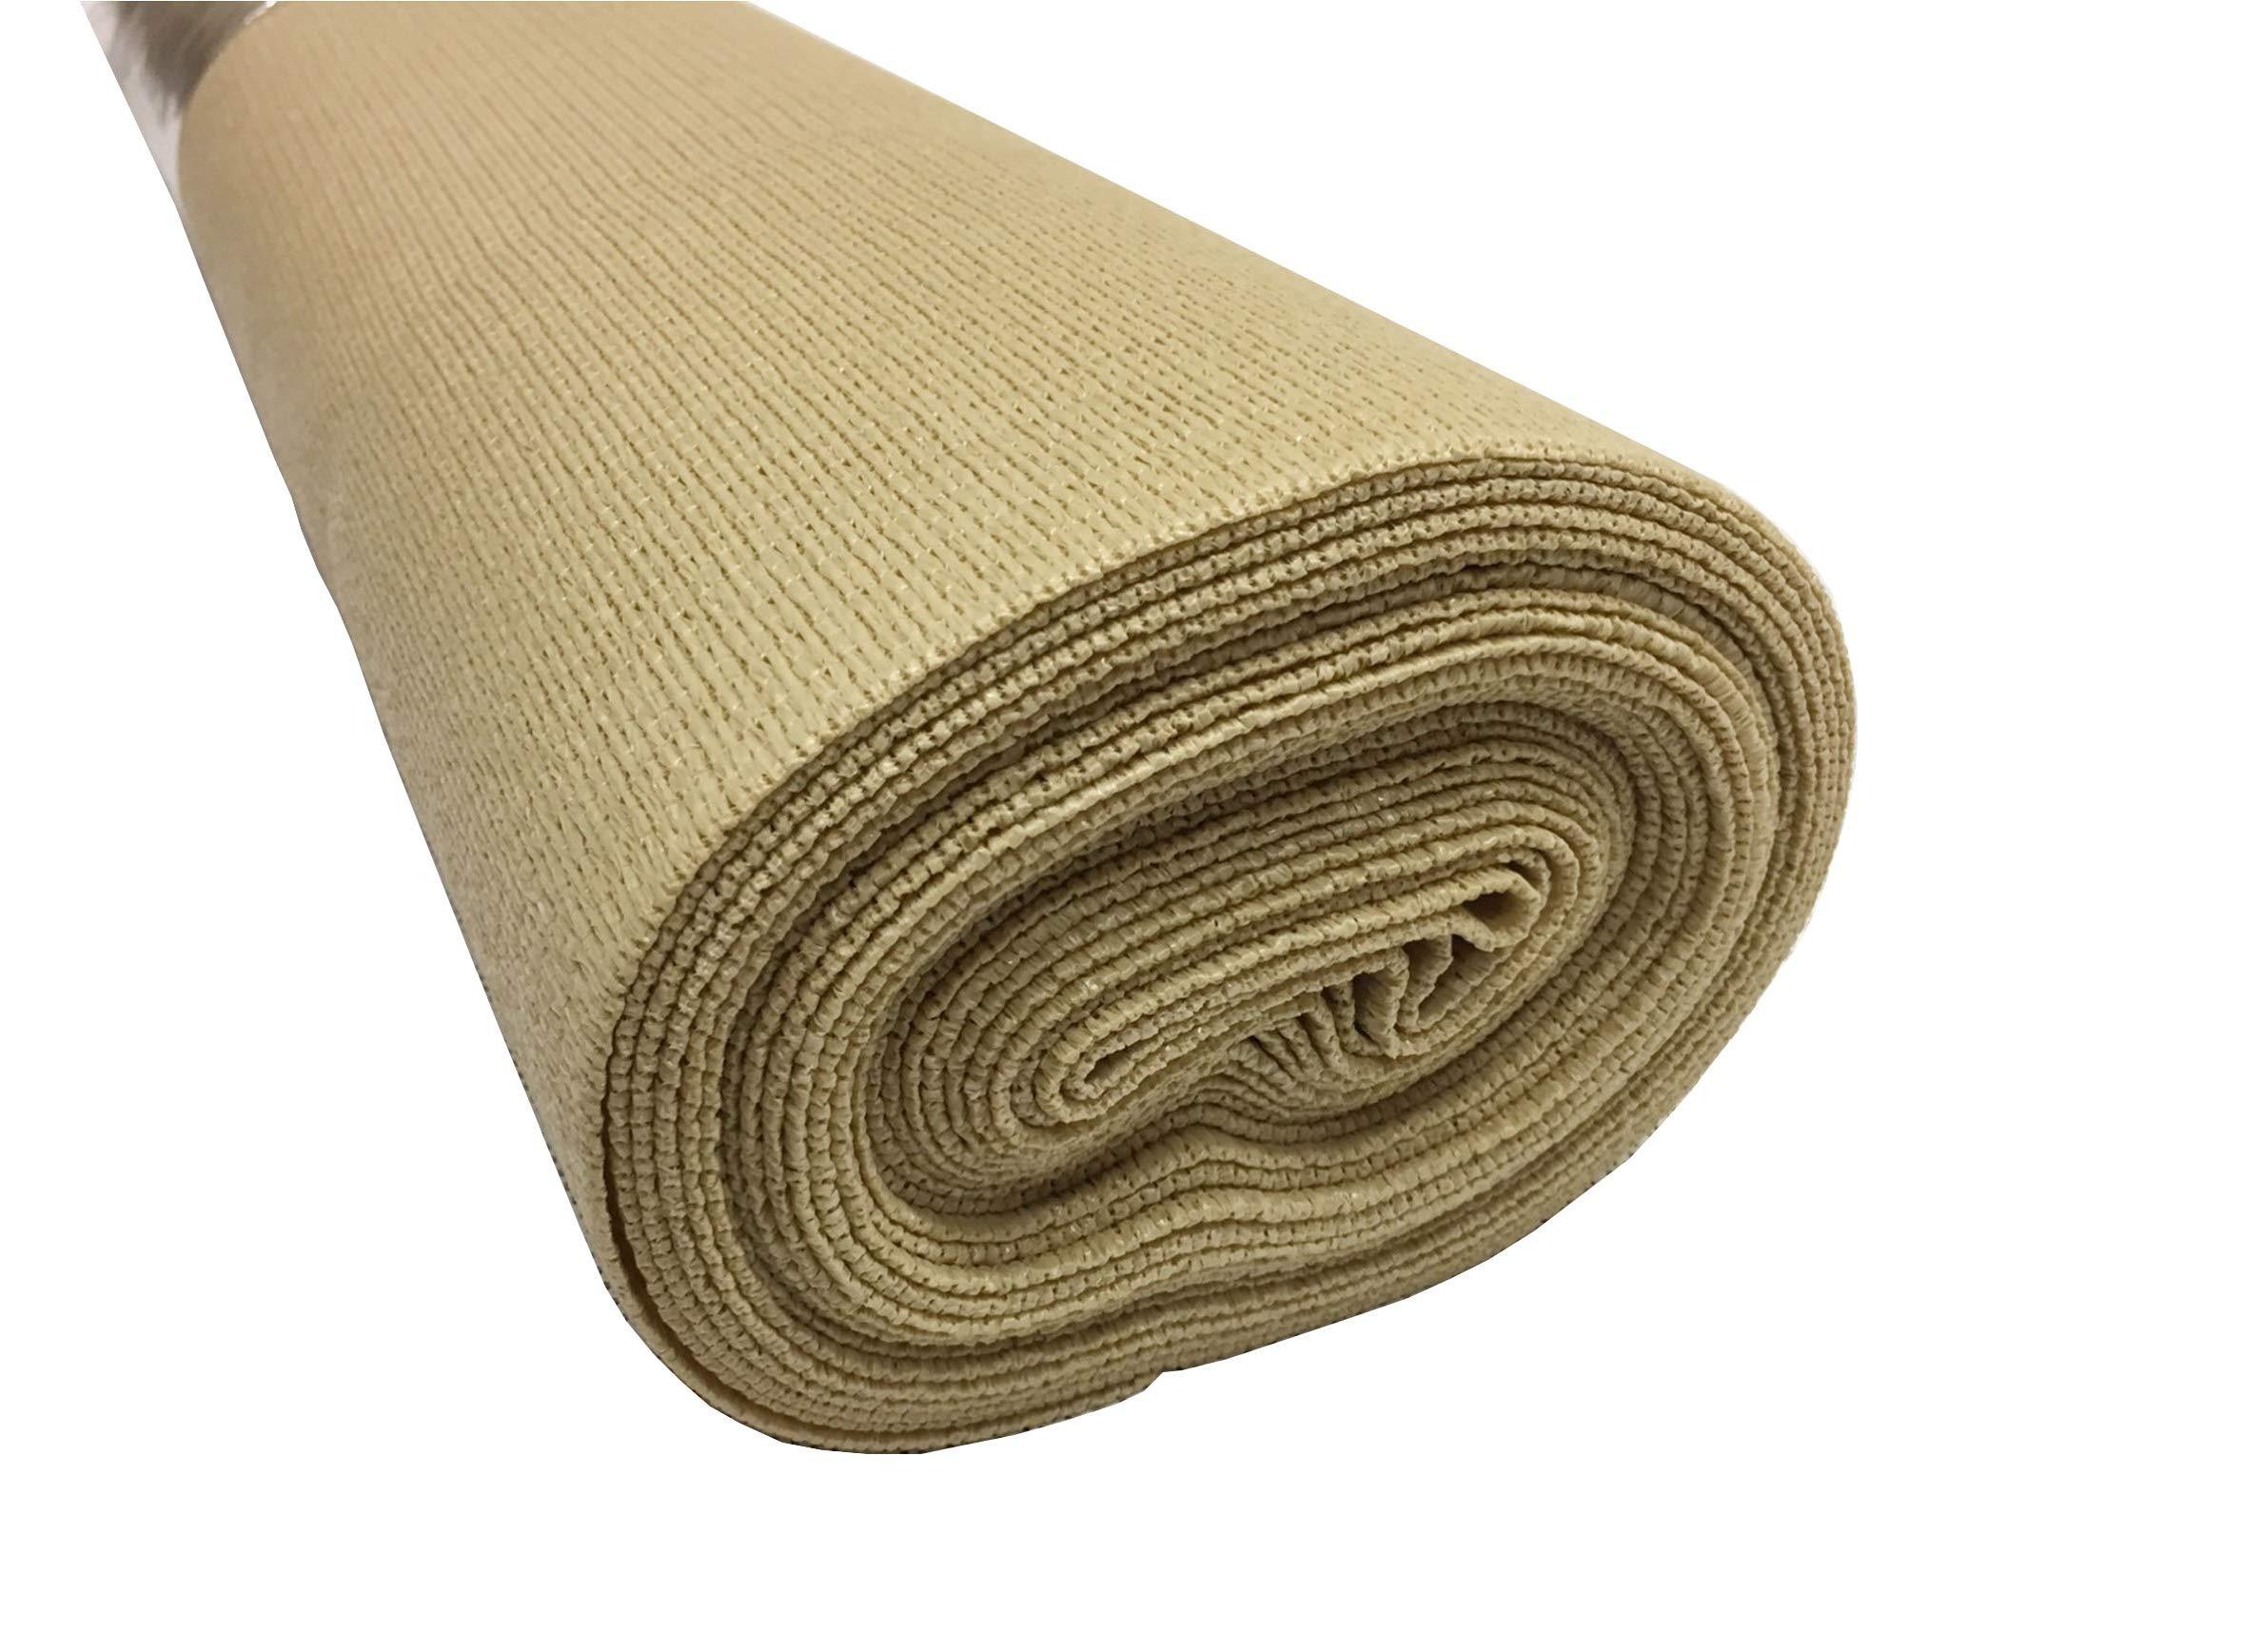 iDeal Fabrics Outdoor Shade Cloth - 5'-8'' x 20' - UV Protection - Shade Fabric (Beige)